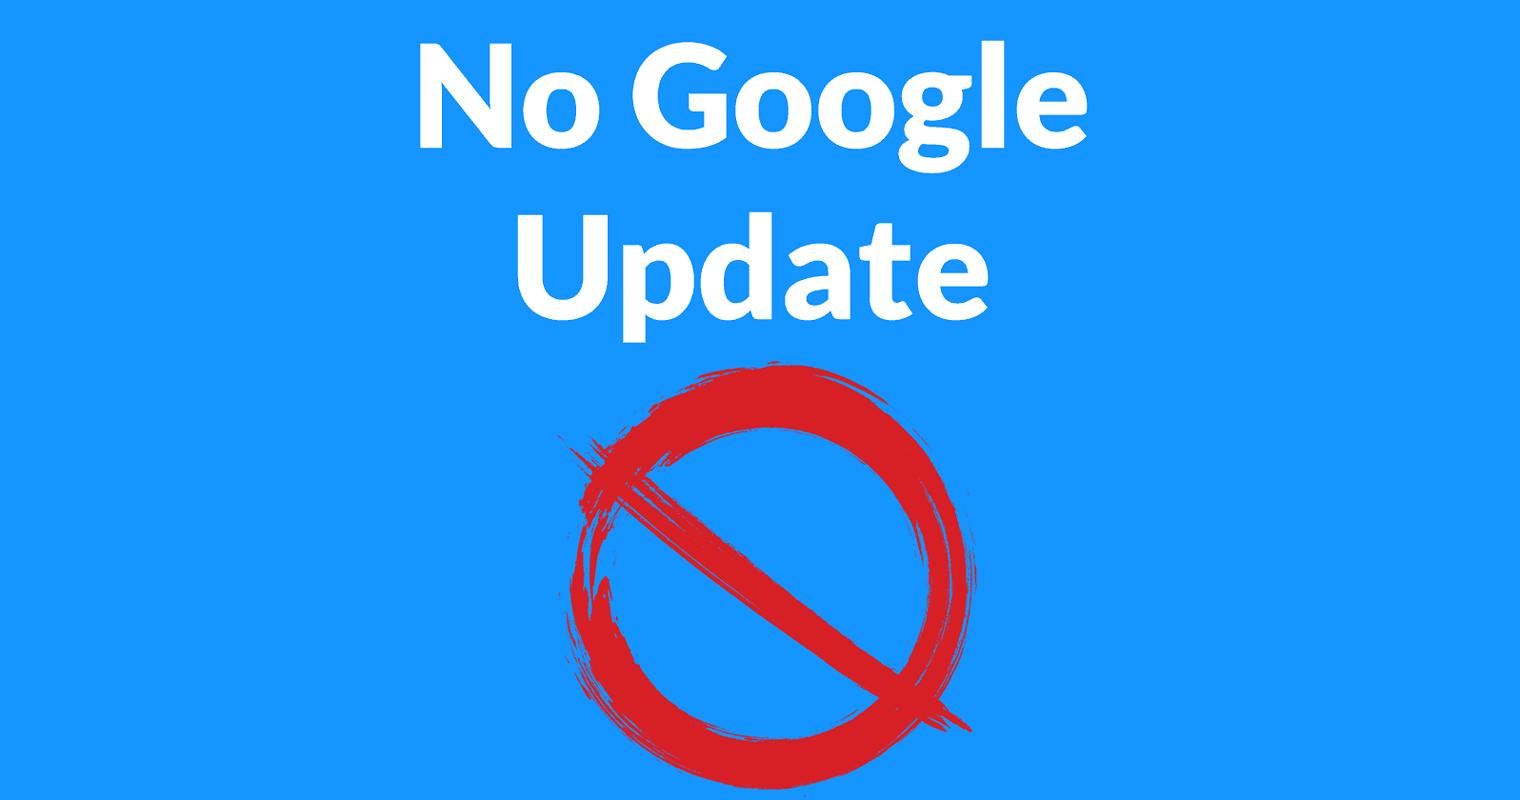 Google Confirms: No Core Update